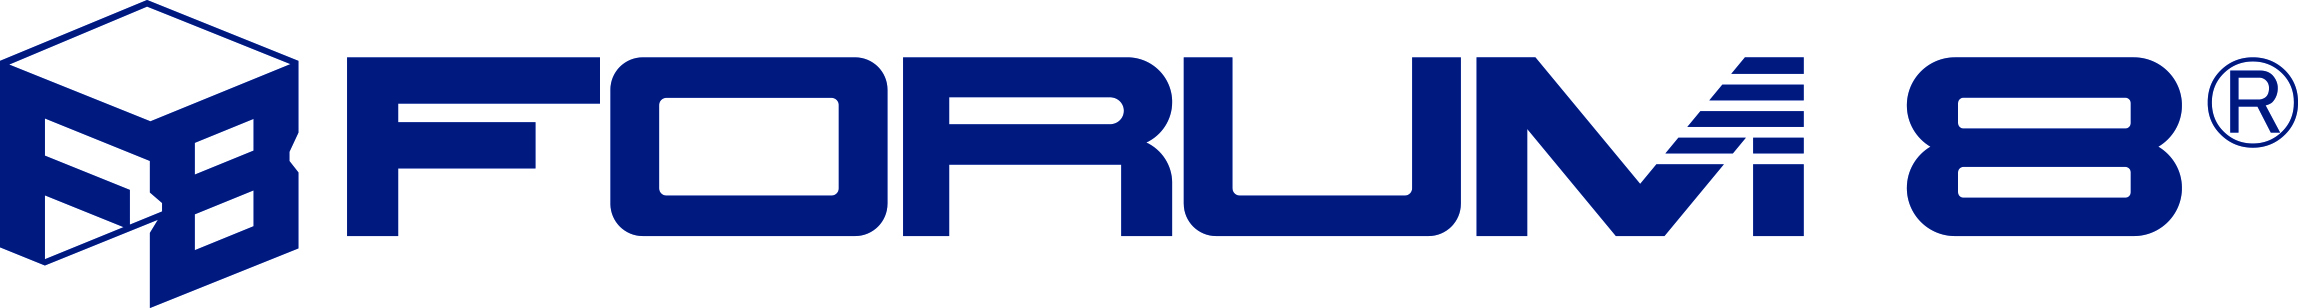 aimsun-text-logo